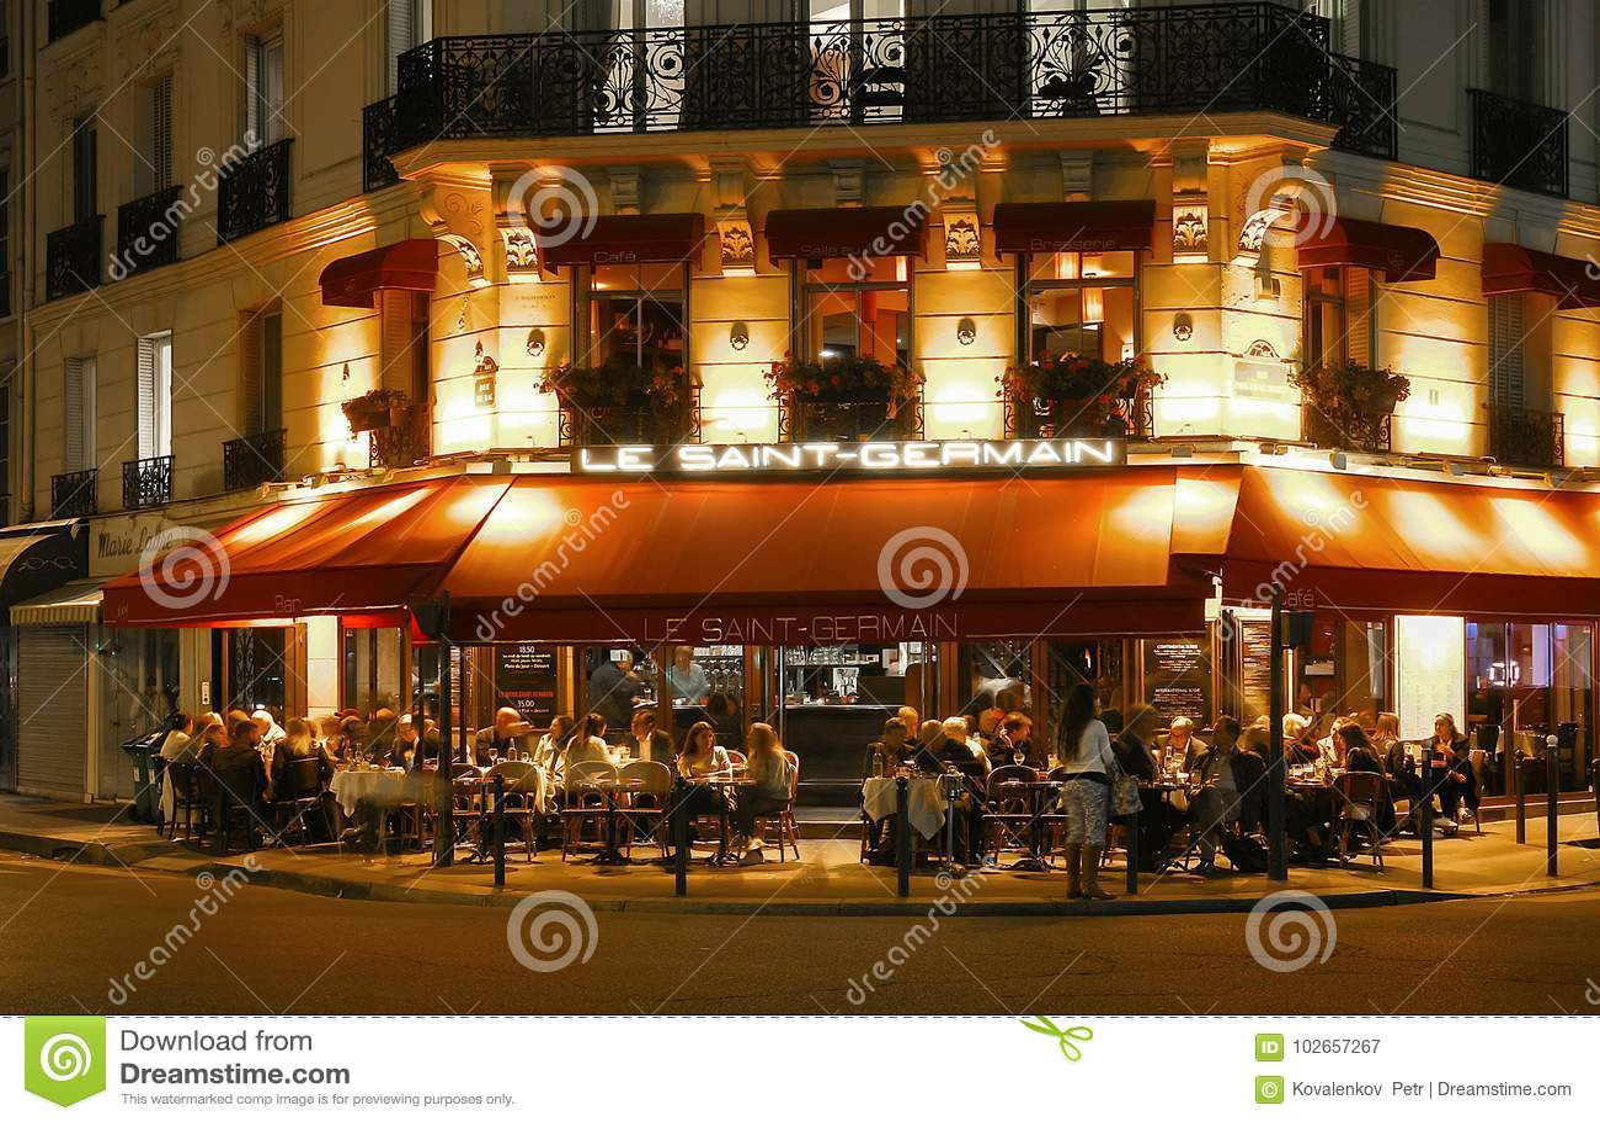 The Famous Cafe Saint Germain At Night,Paris, France